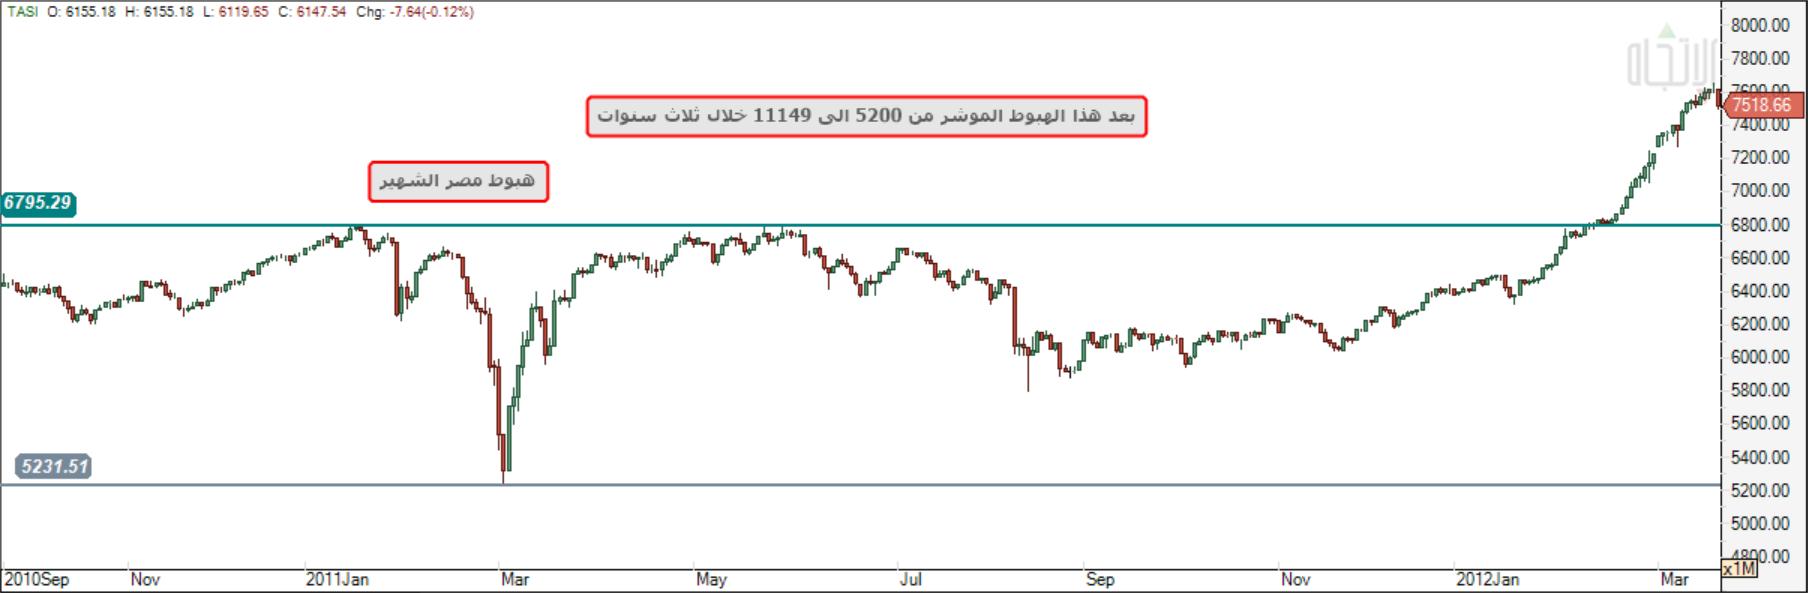 موشر الاسهم السعودي خلال ماتبقى 2018